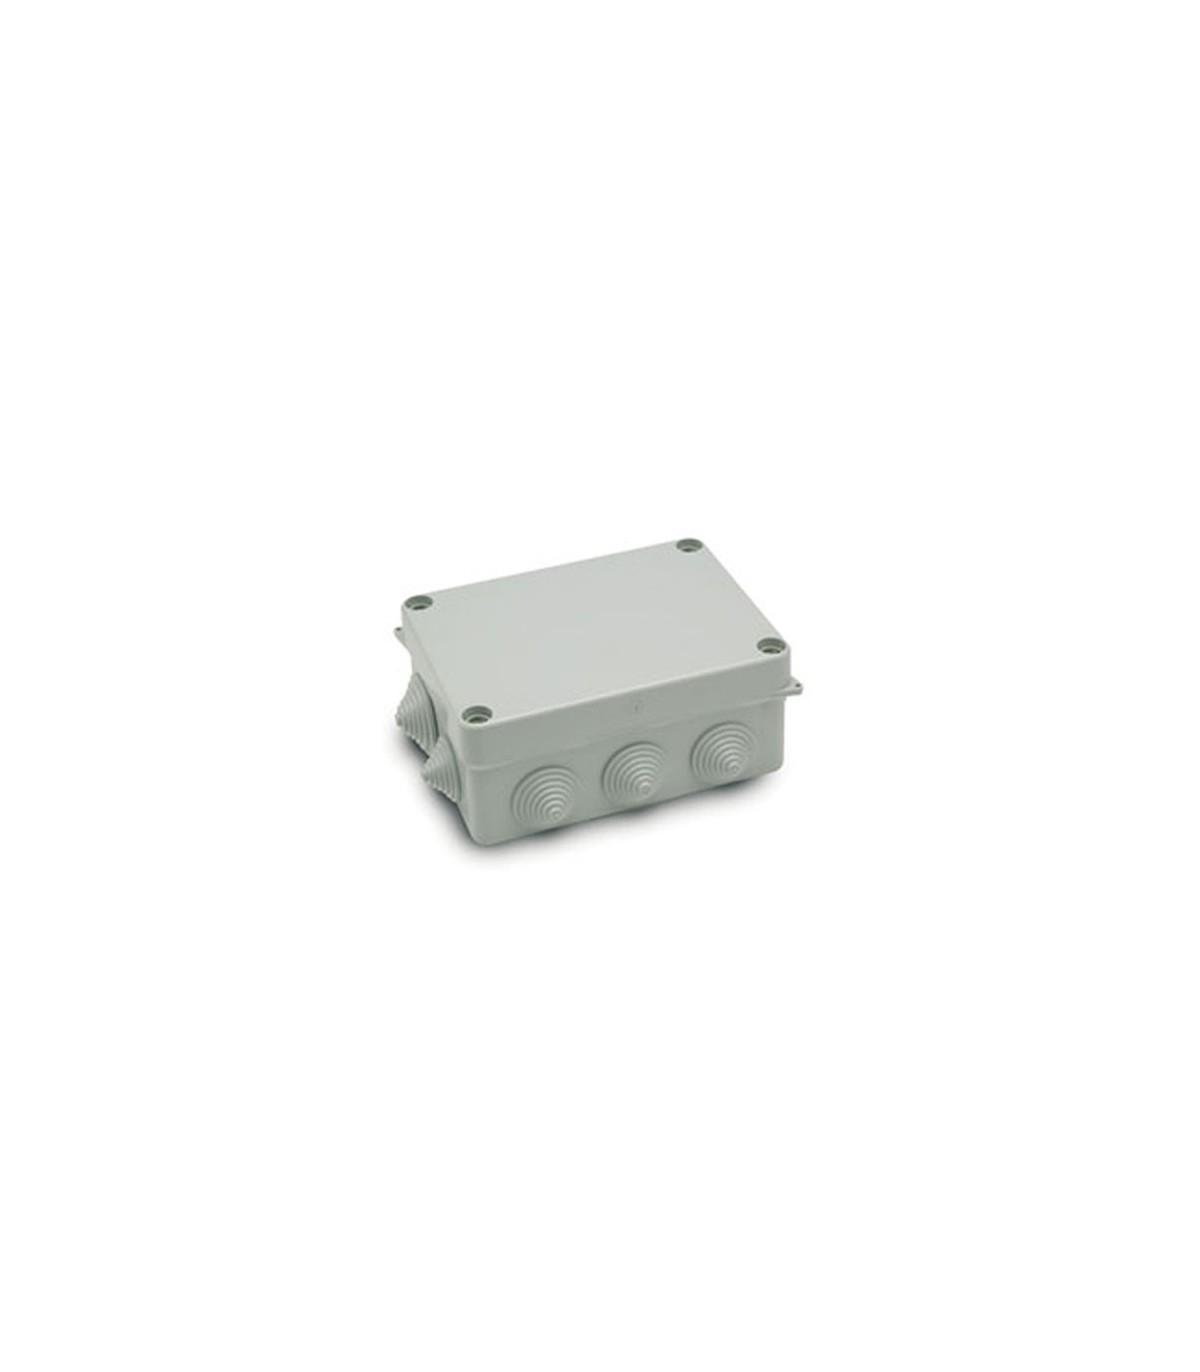 SOLERA 100888 Caja Estanca